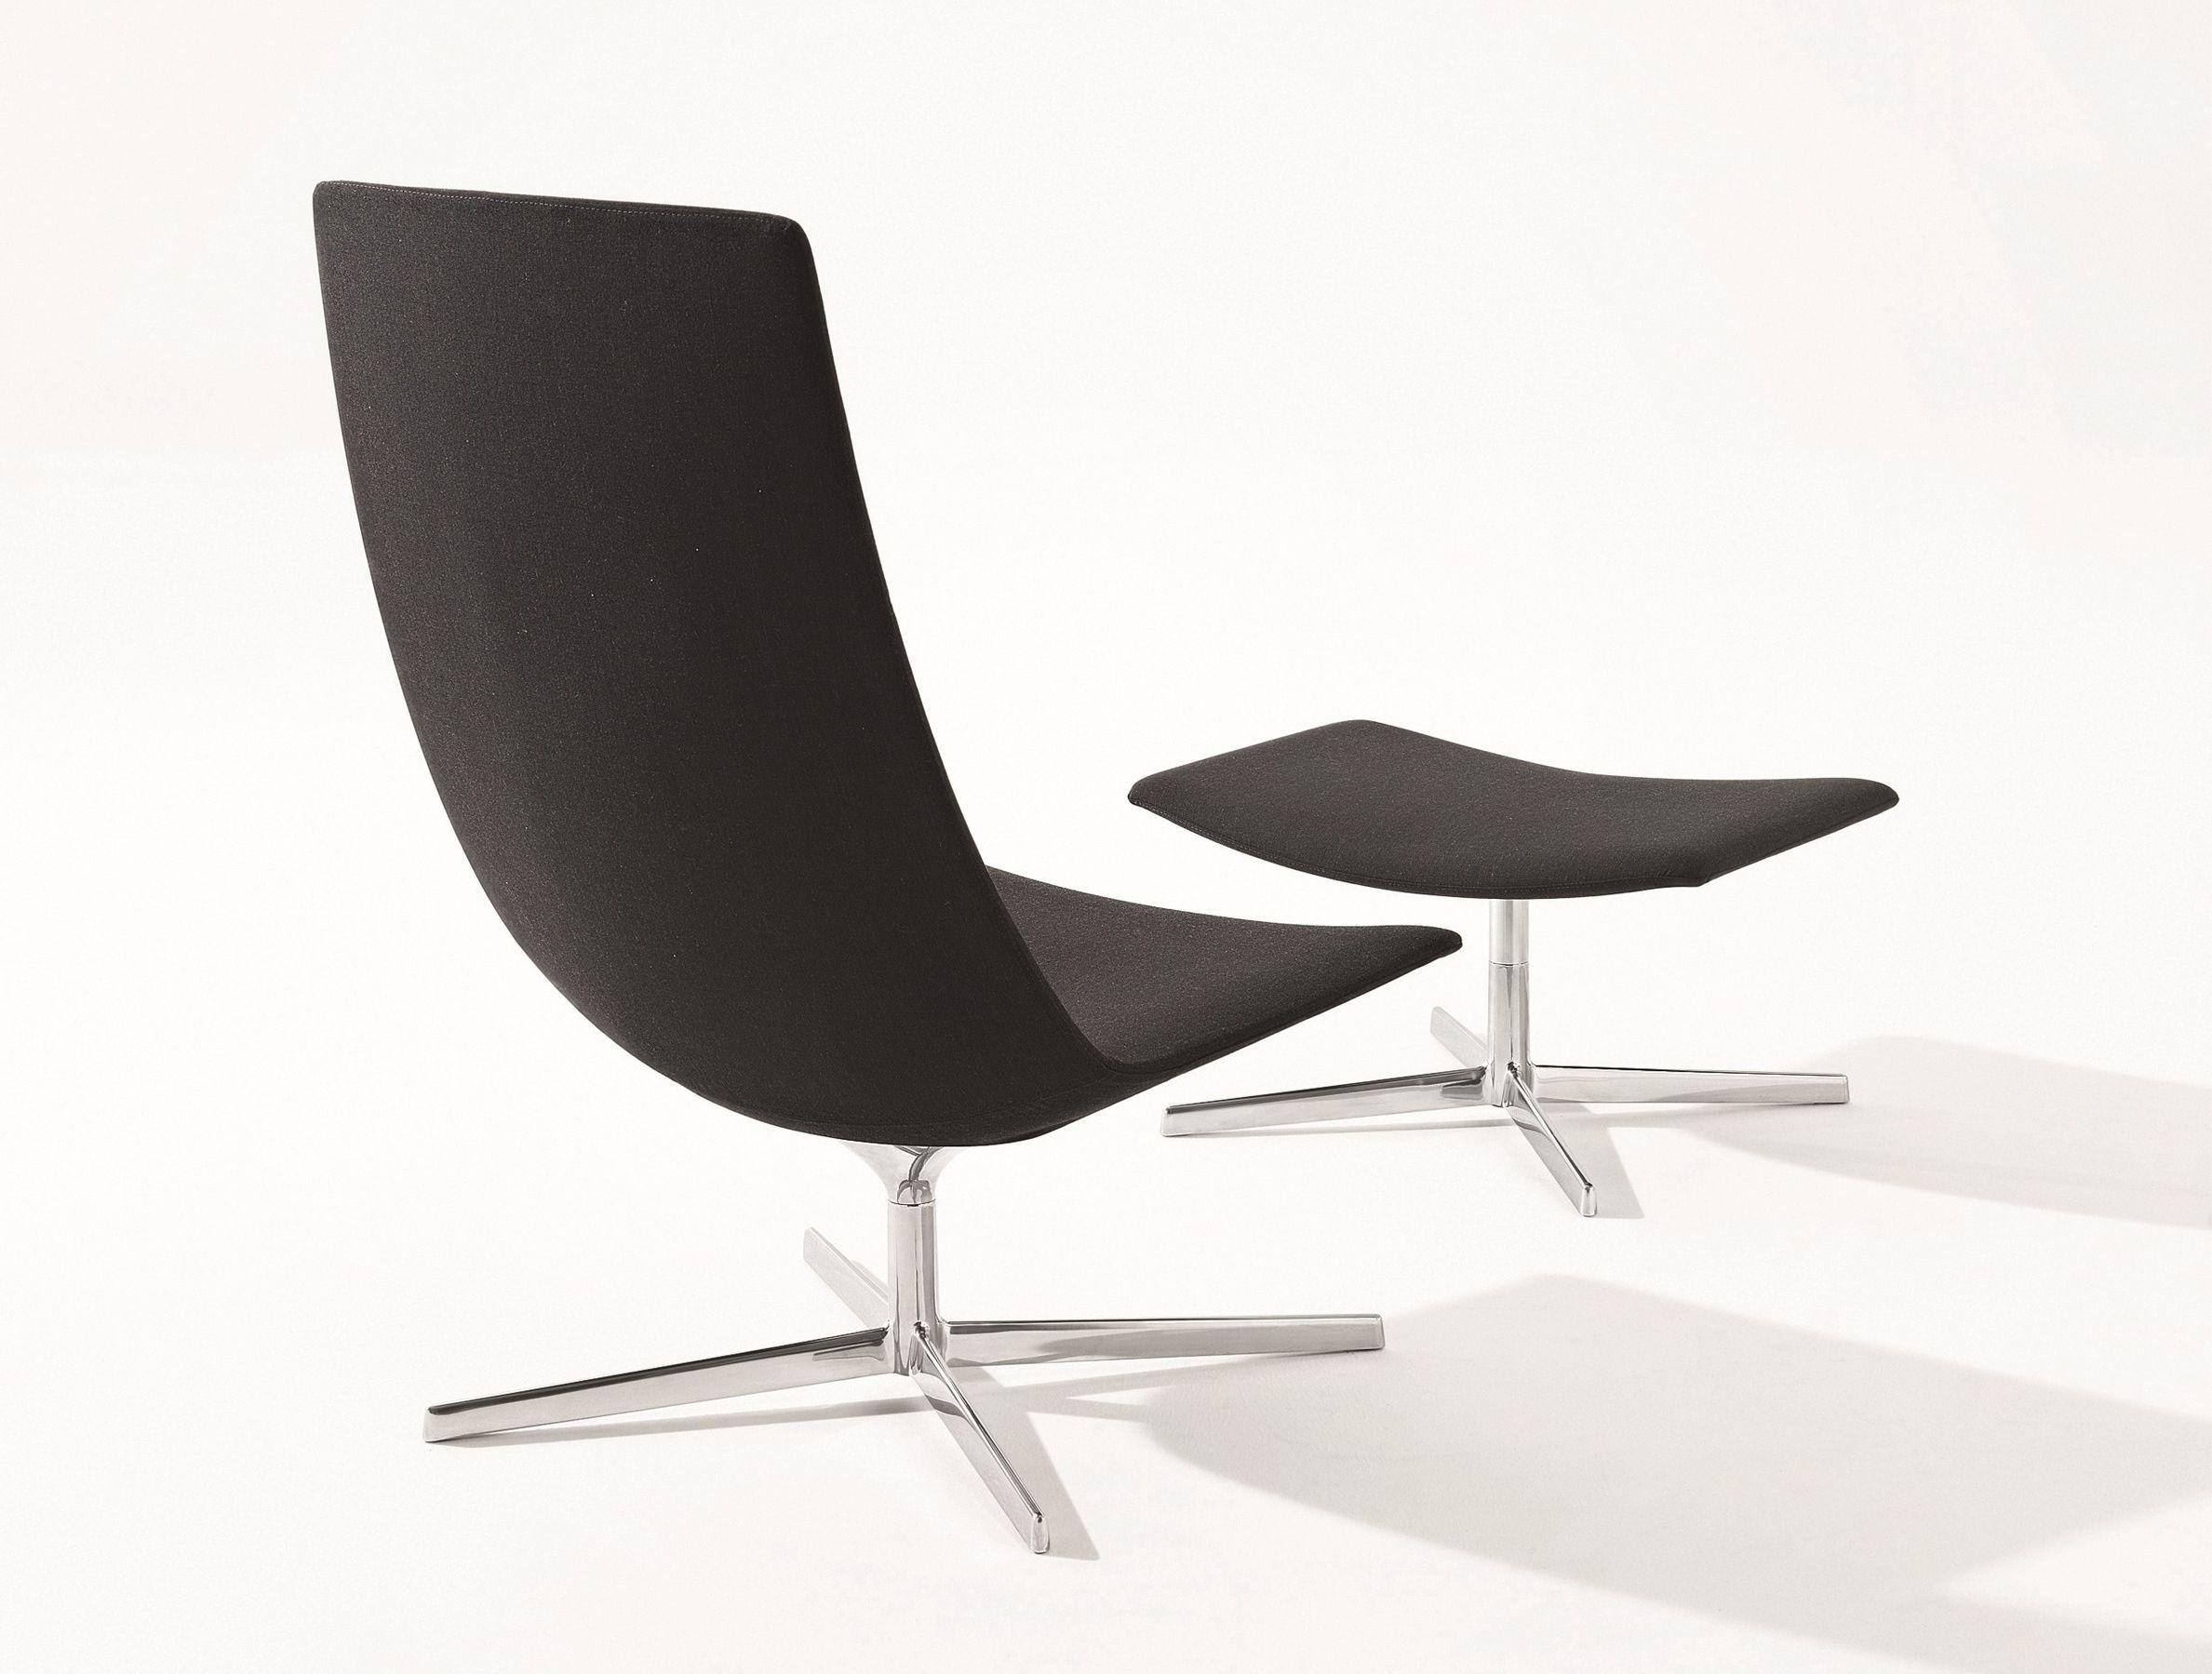 Arper Catifa 60 lounge design by Lievore Altherr